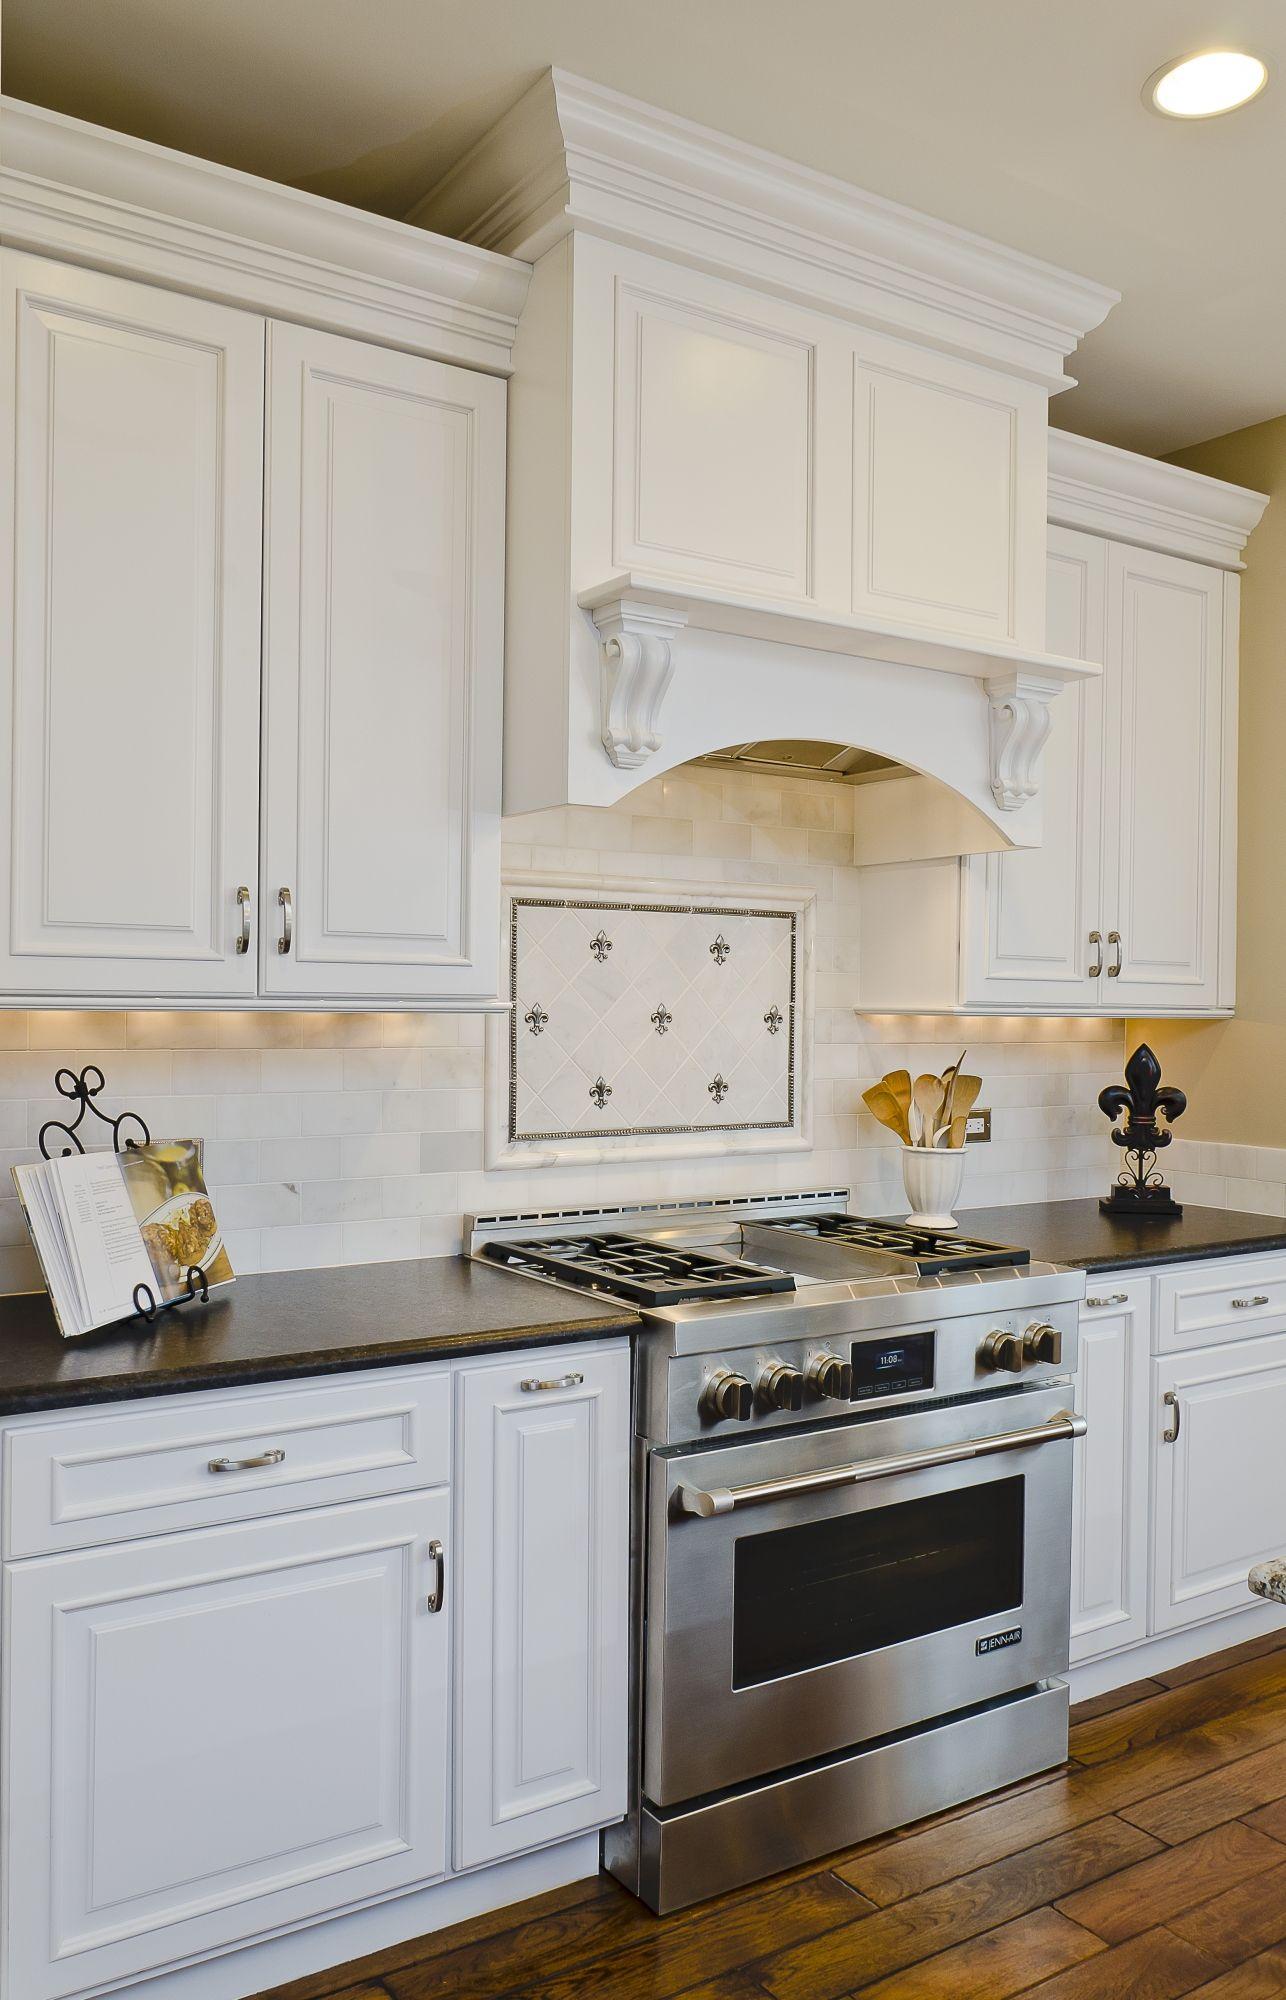 Luxury Lyfe Kitchen Festooning - Kitchen Cabinets | Ideas ...